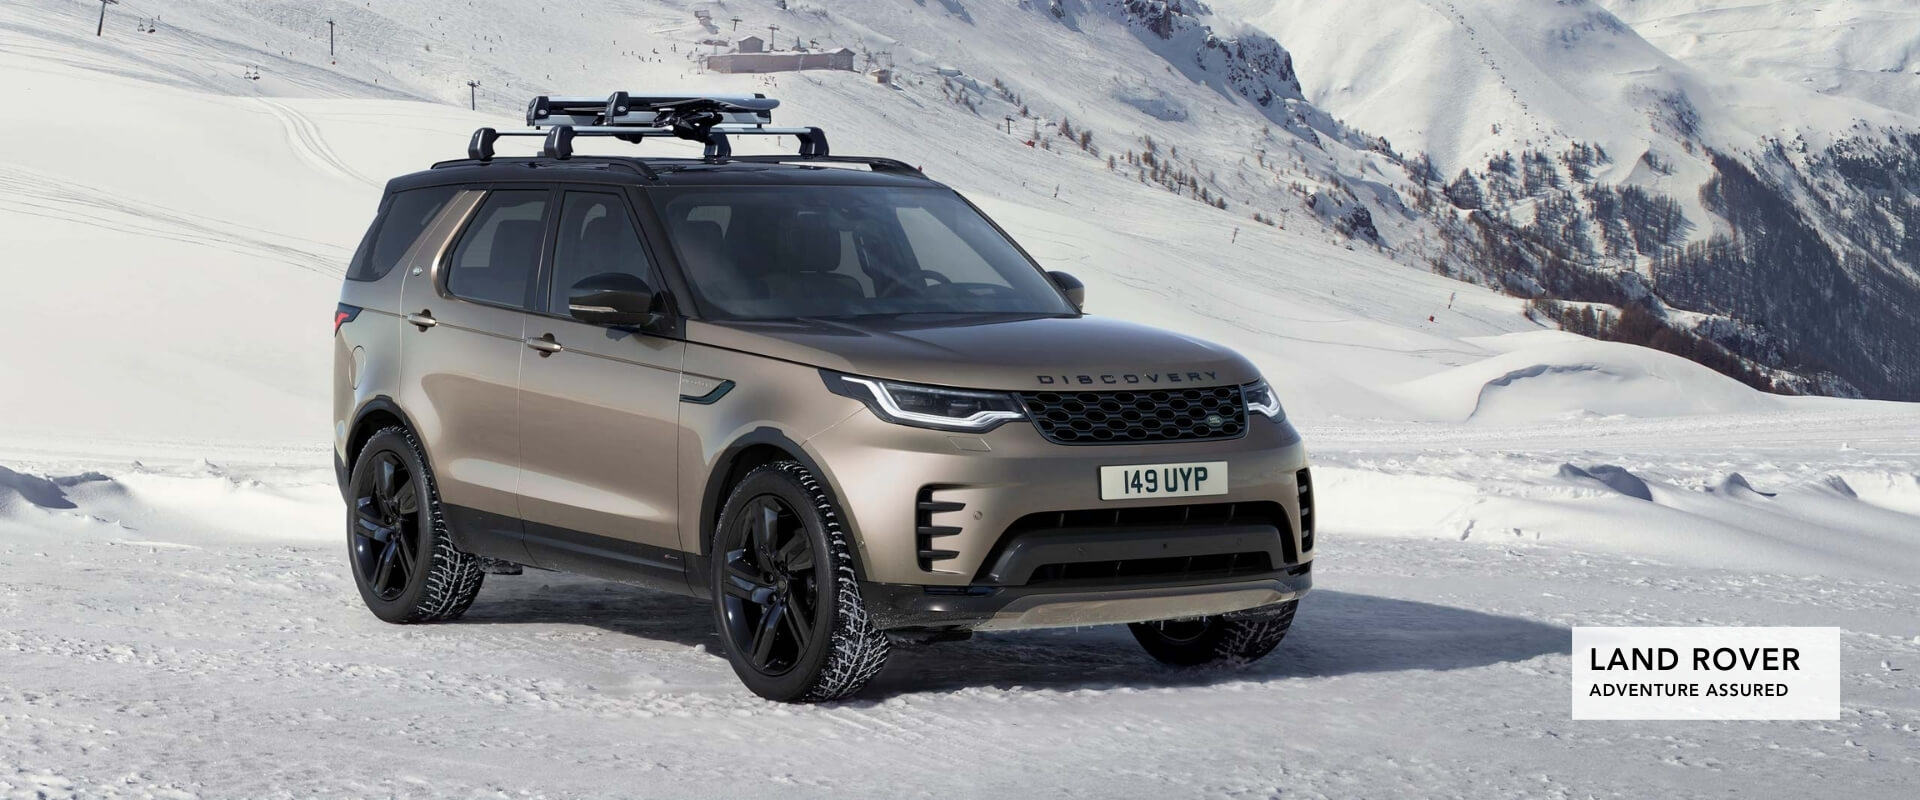 Land Rover. Adventure Assured.